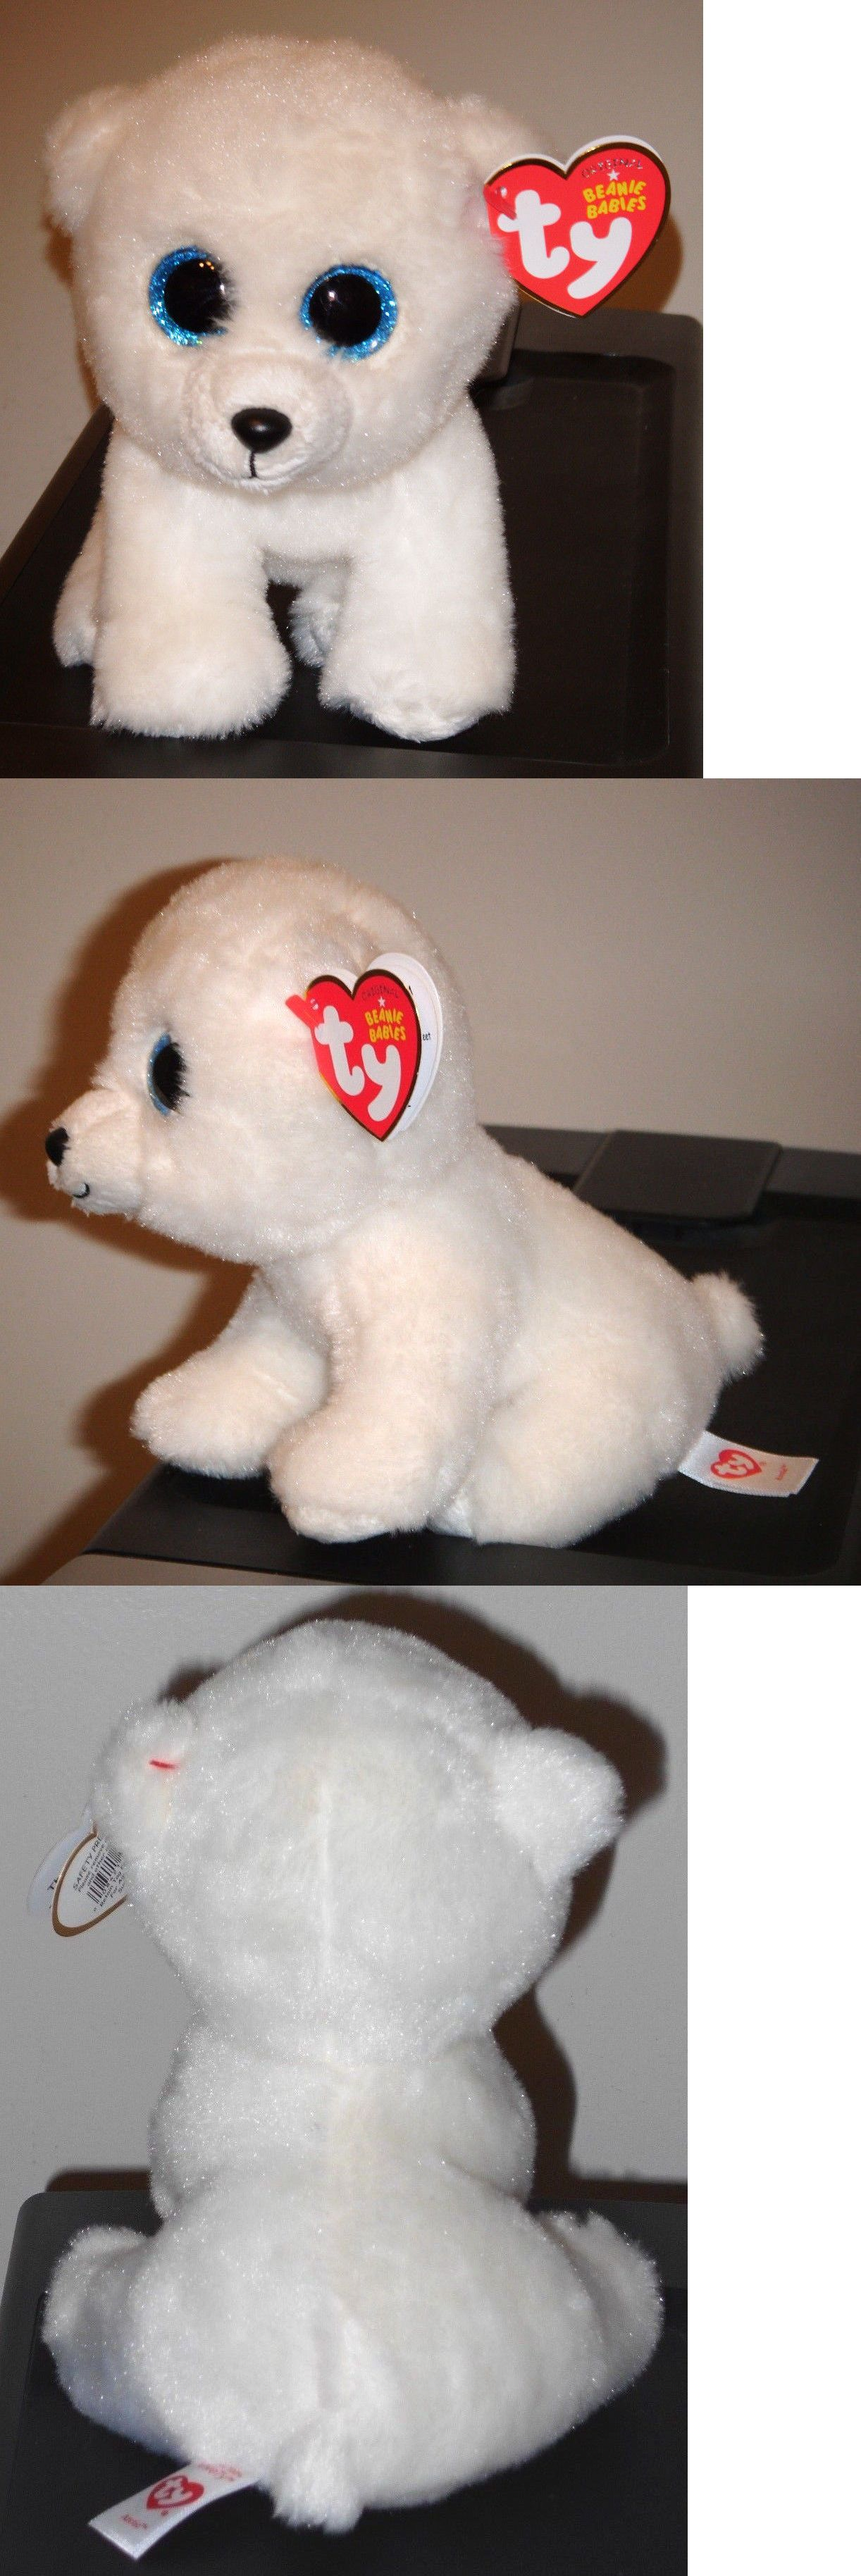 MWMT 6 Inch Ty Beanie Baby ~ ARCTIC the Polar Bear